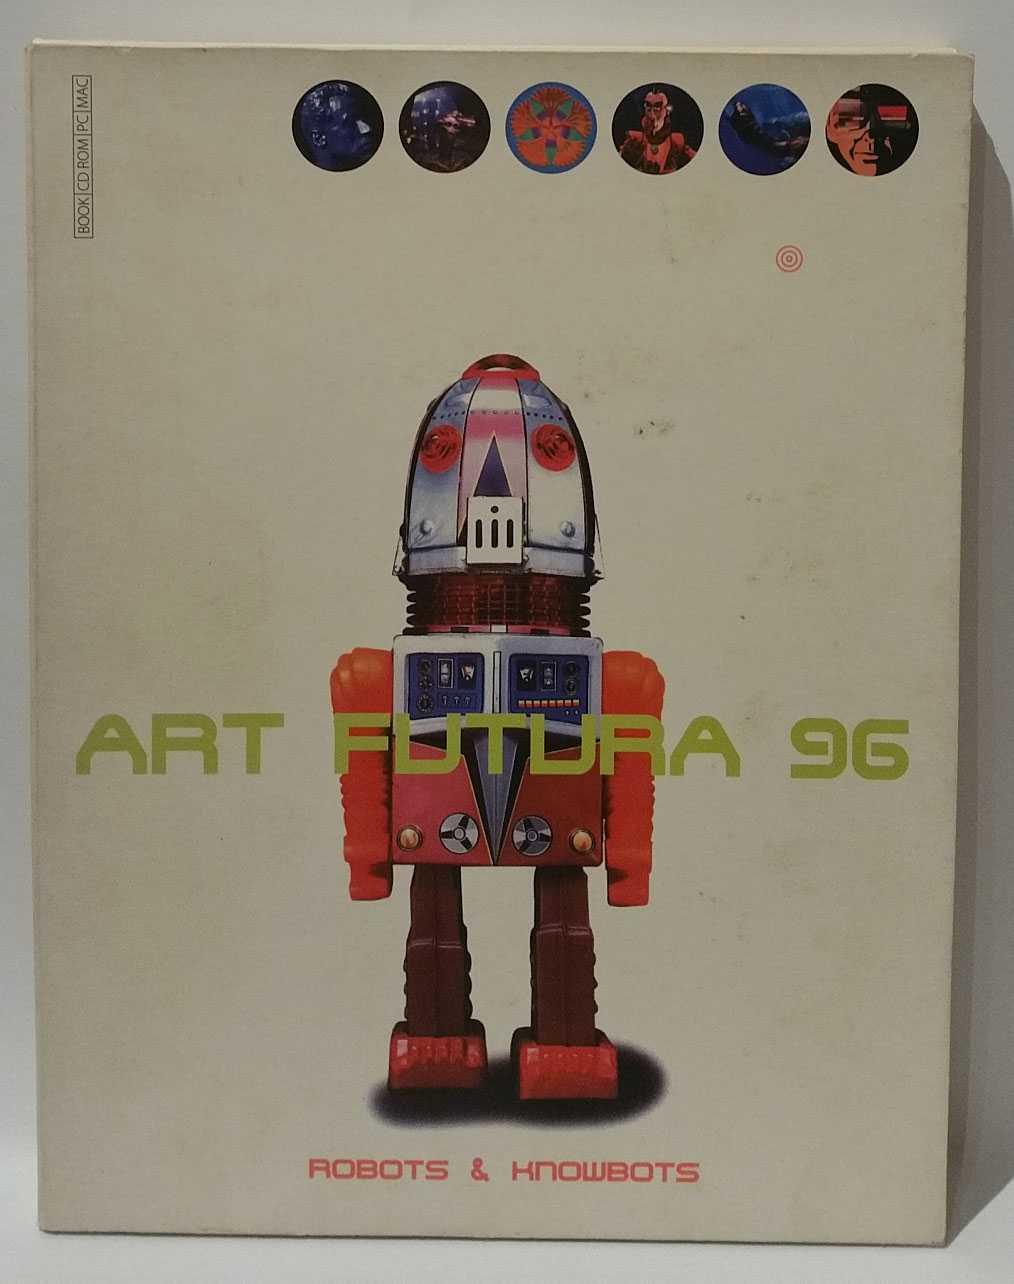 Art Futura 96: Robots & Knowbots, Montxo Algora